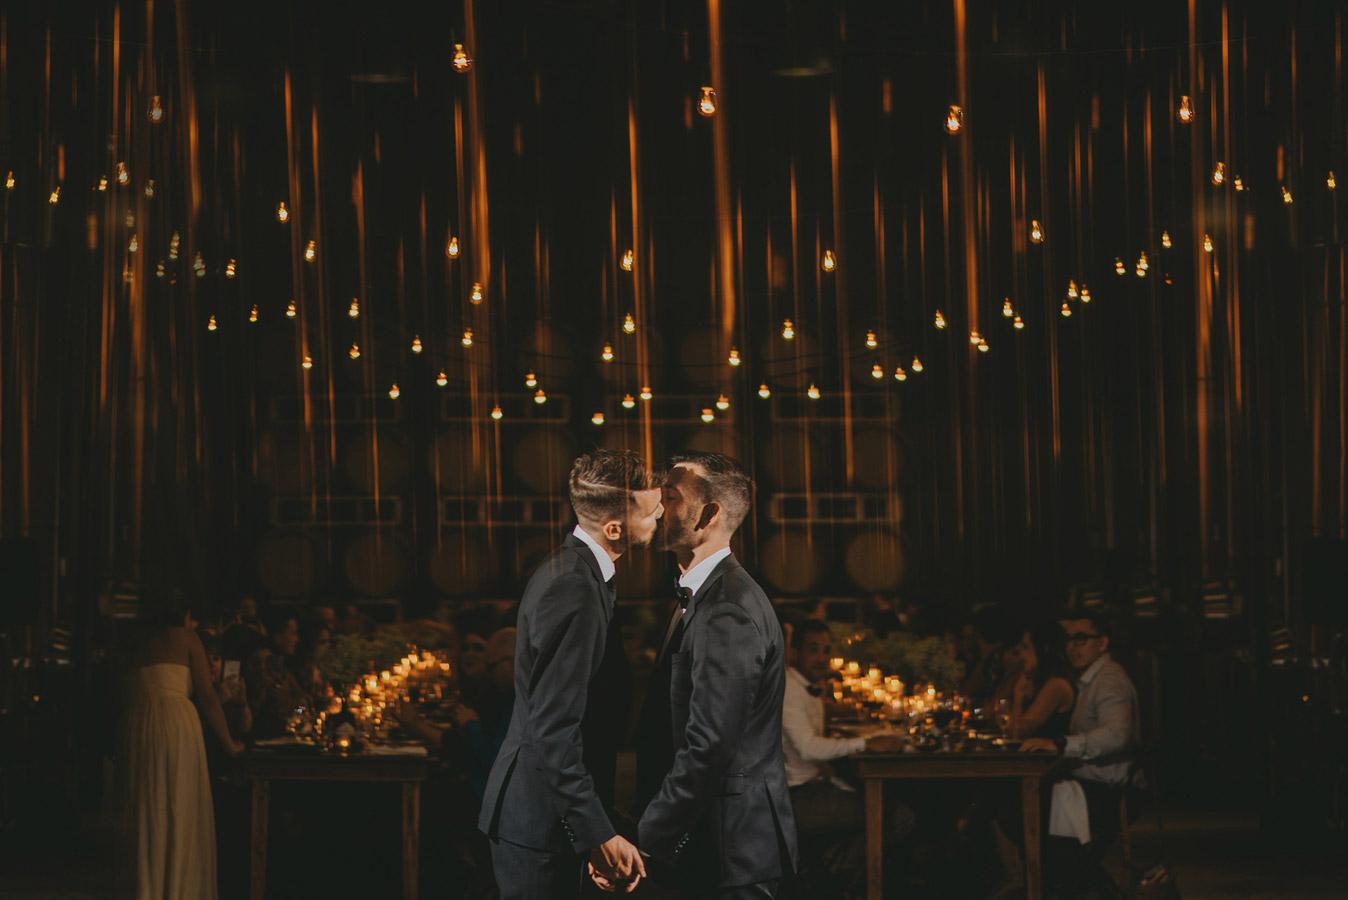 © Joel Jaszczyszak, Joelsview Photography, Kelowna, BC, Canada, 3st place in category Professional : Wedding Reception, Rangefinder Wedding Contest 2017 Winners